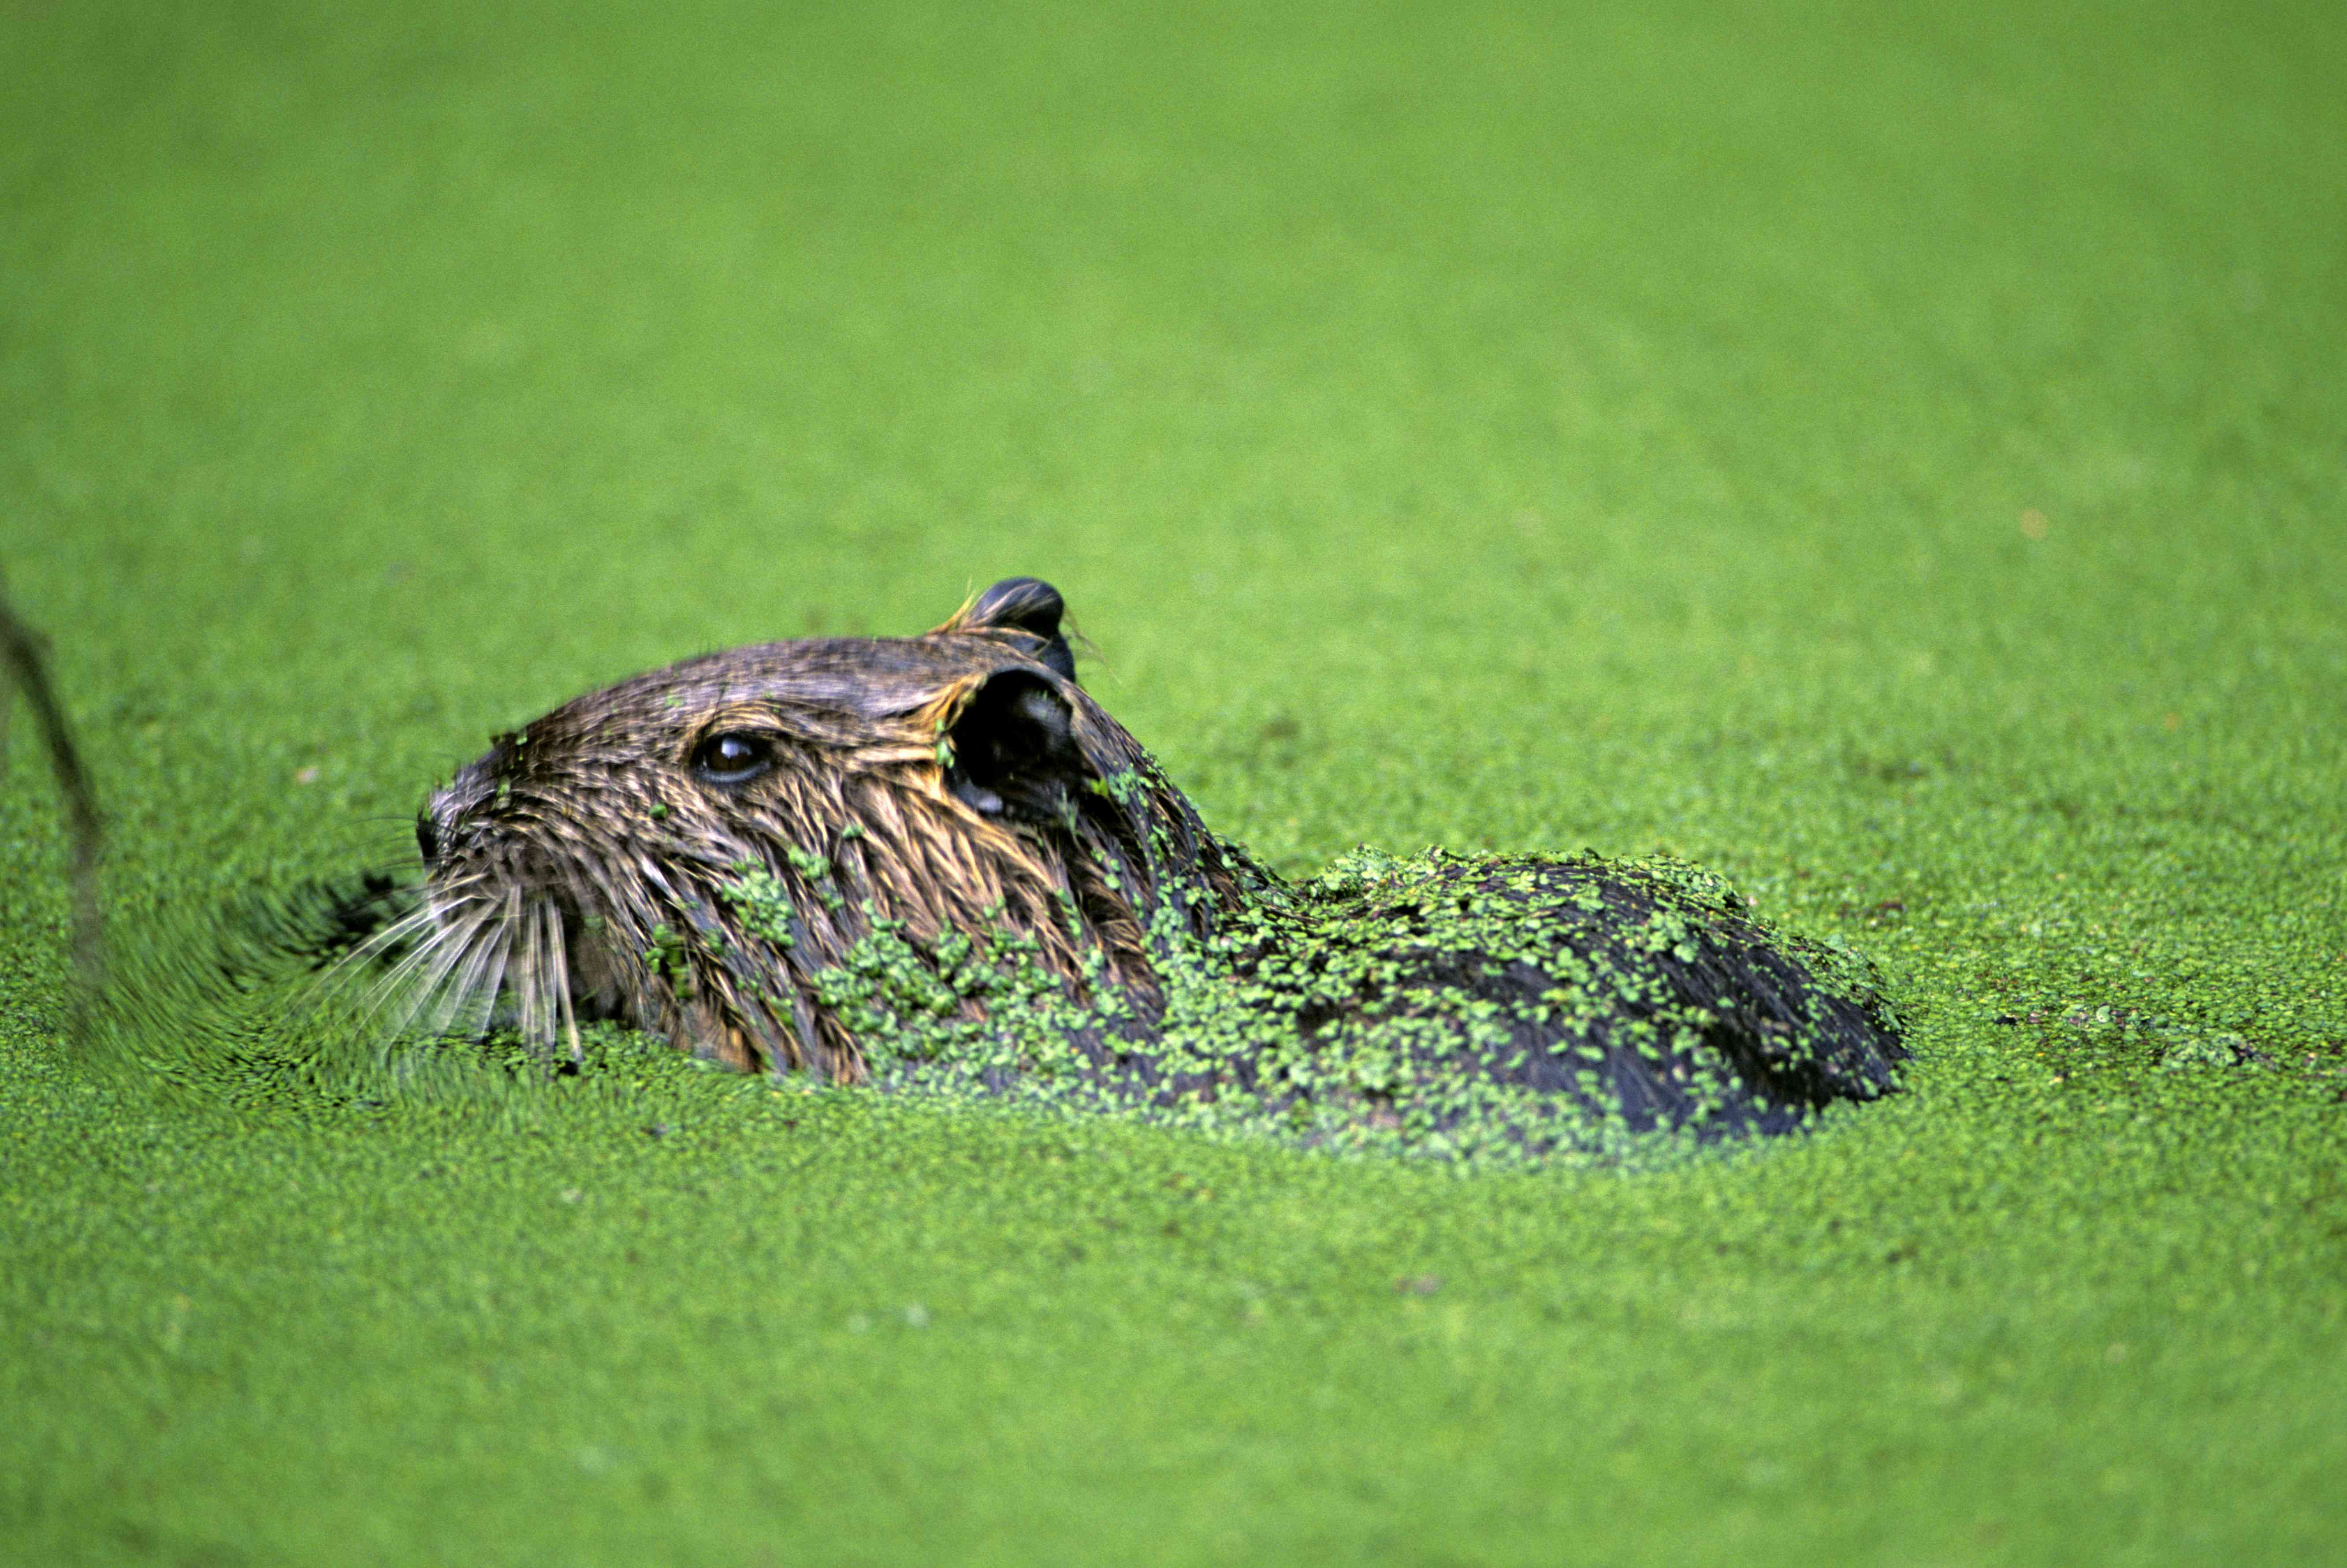 Nutria or Coypu, Myocastor coypus, in swamp, Louisiana, USA. Introduced from South America